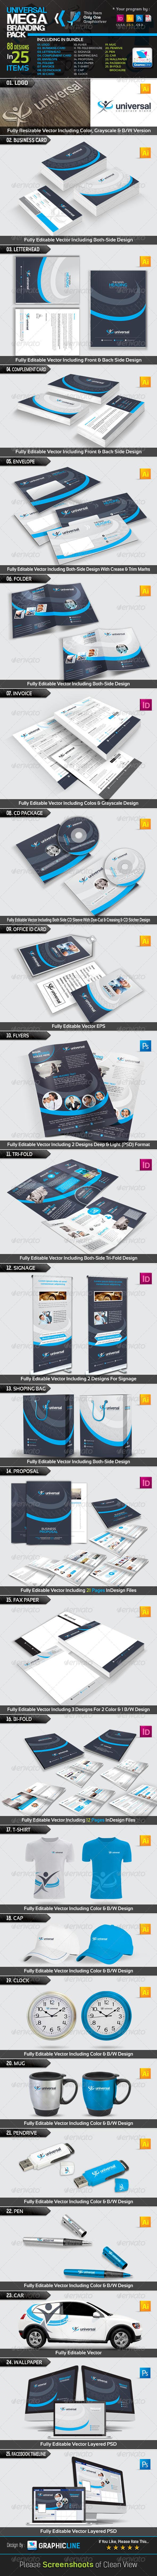 GraphicRiver Universal Mega Branding Pack 7715773